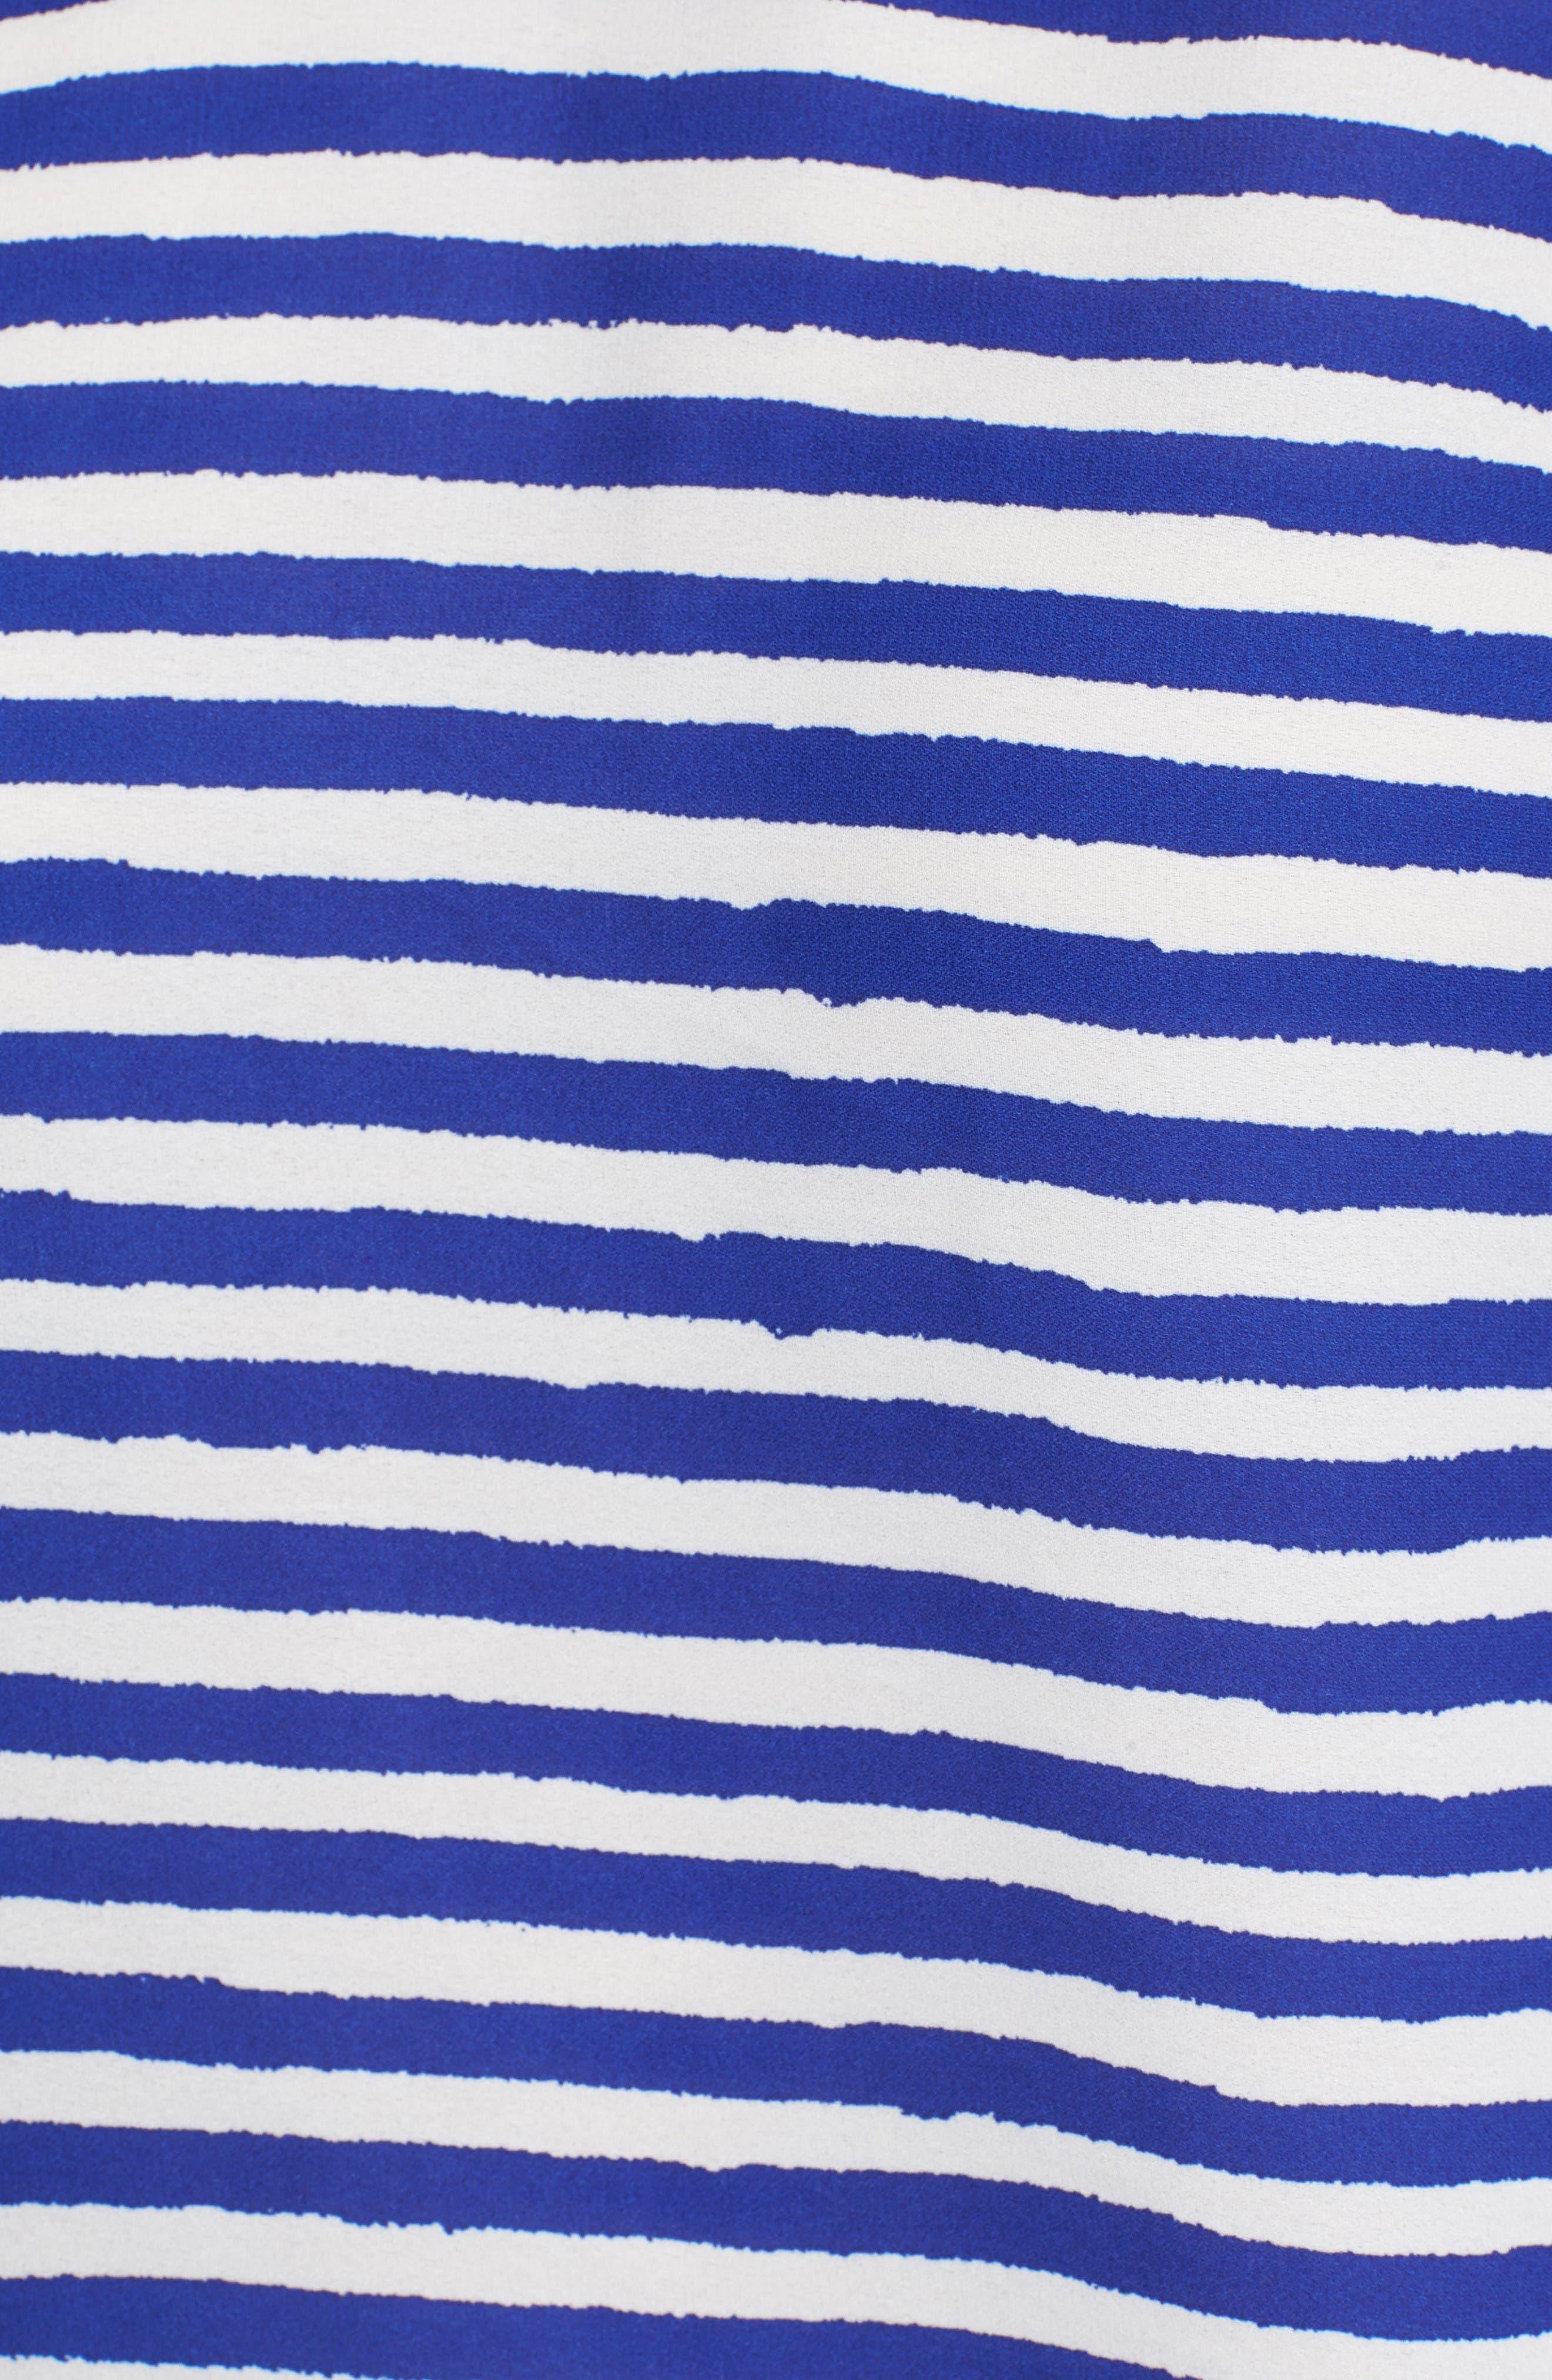 Tulip Sleeve Stripe Blouse,                             Alternate thumbnail 5, color,                             Regatta Blue